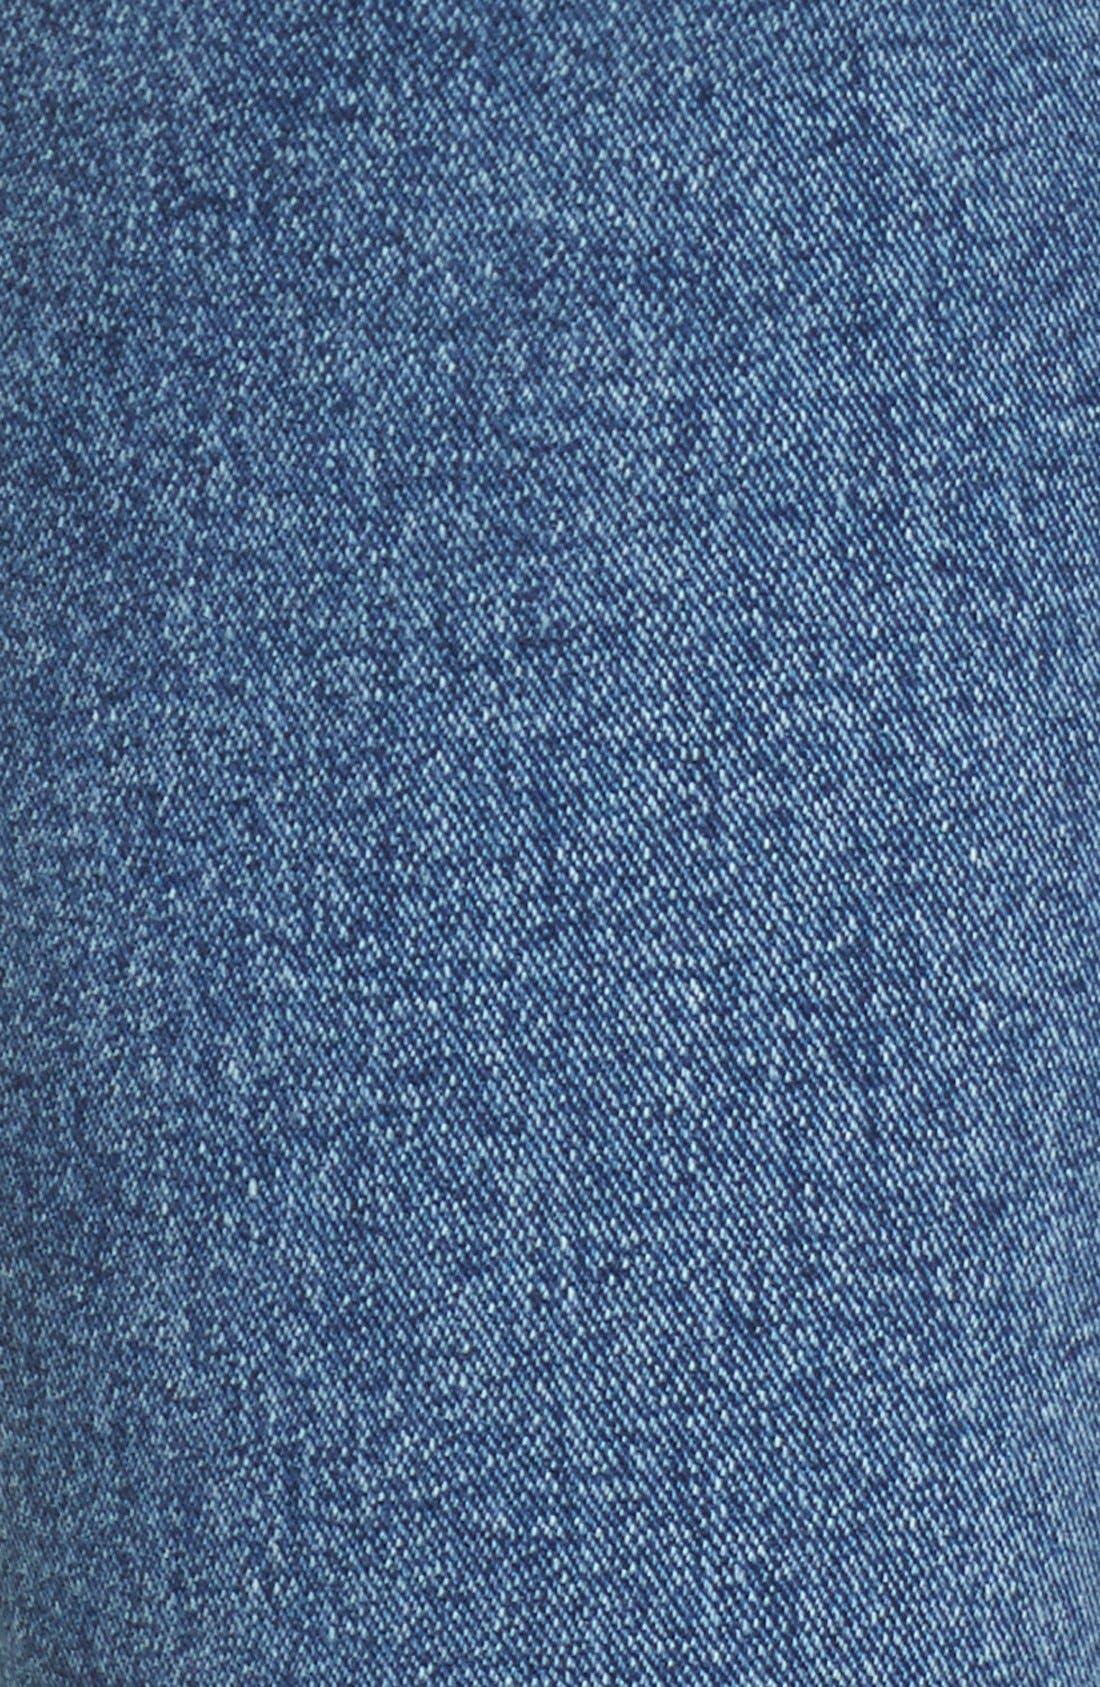 Alternate Image 5  - Rolla's 'East Coast' High Rise Ankle Skinny Jeans (Folk Blue)